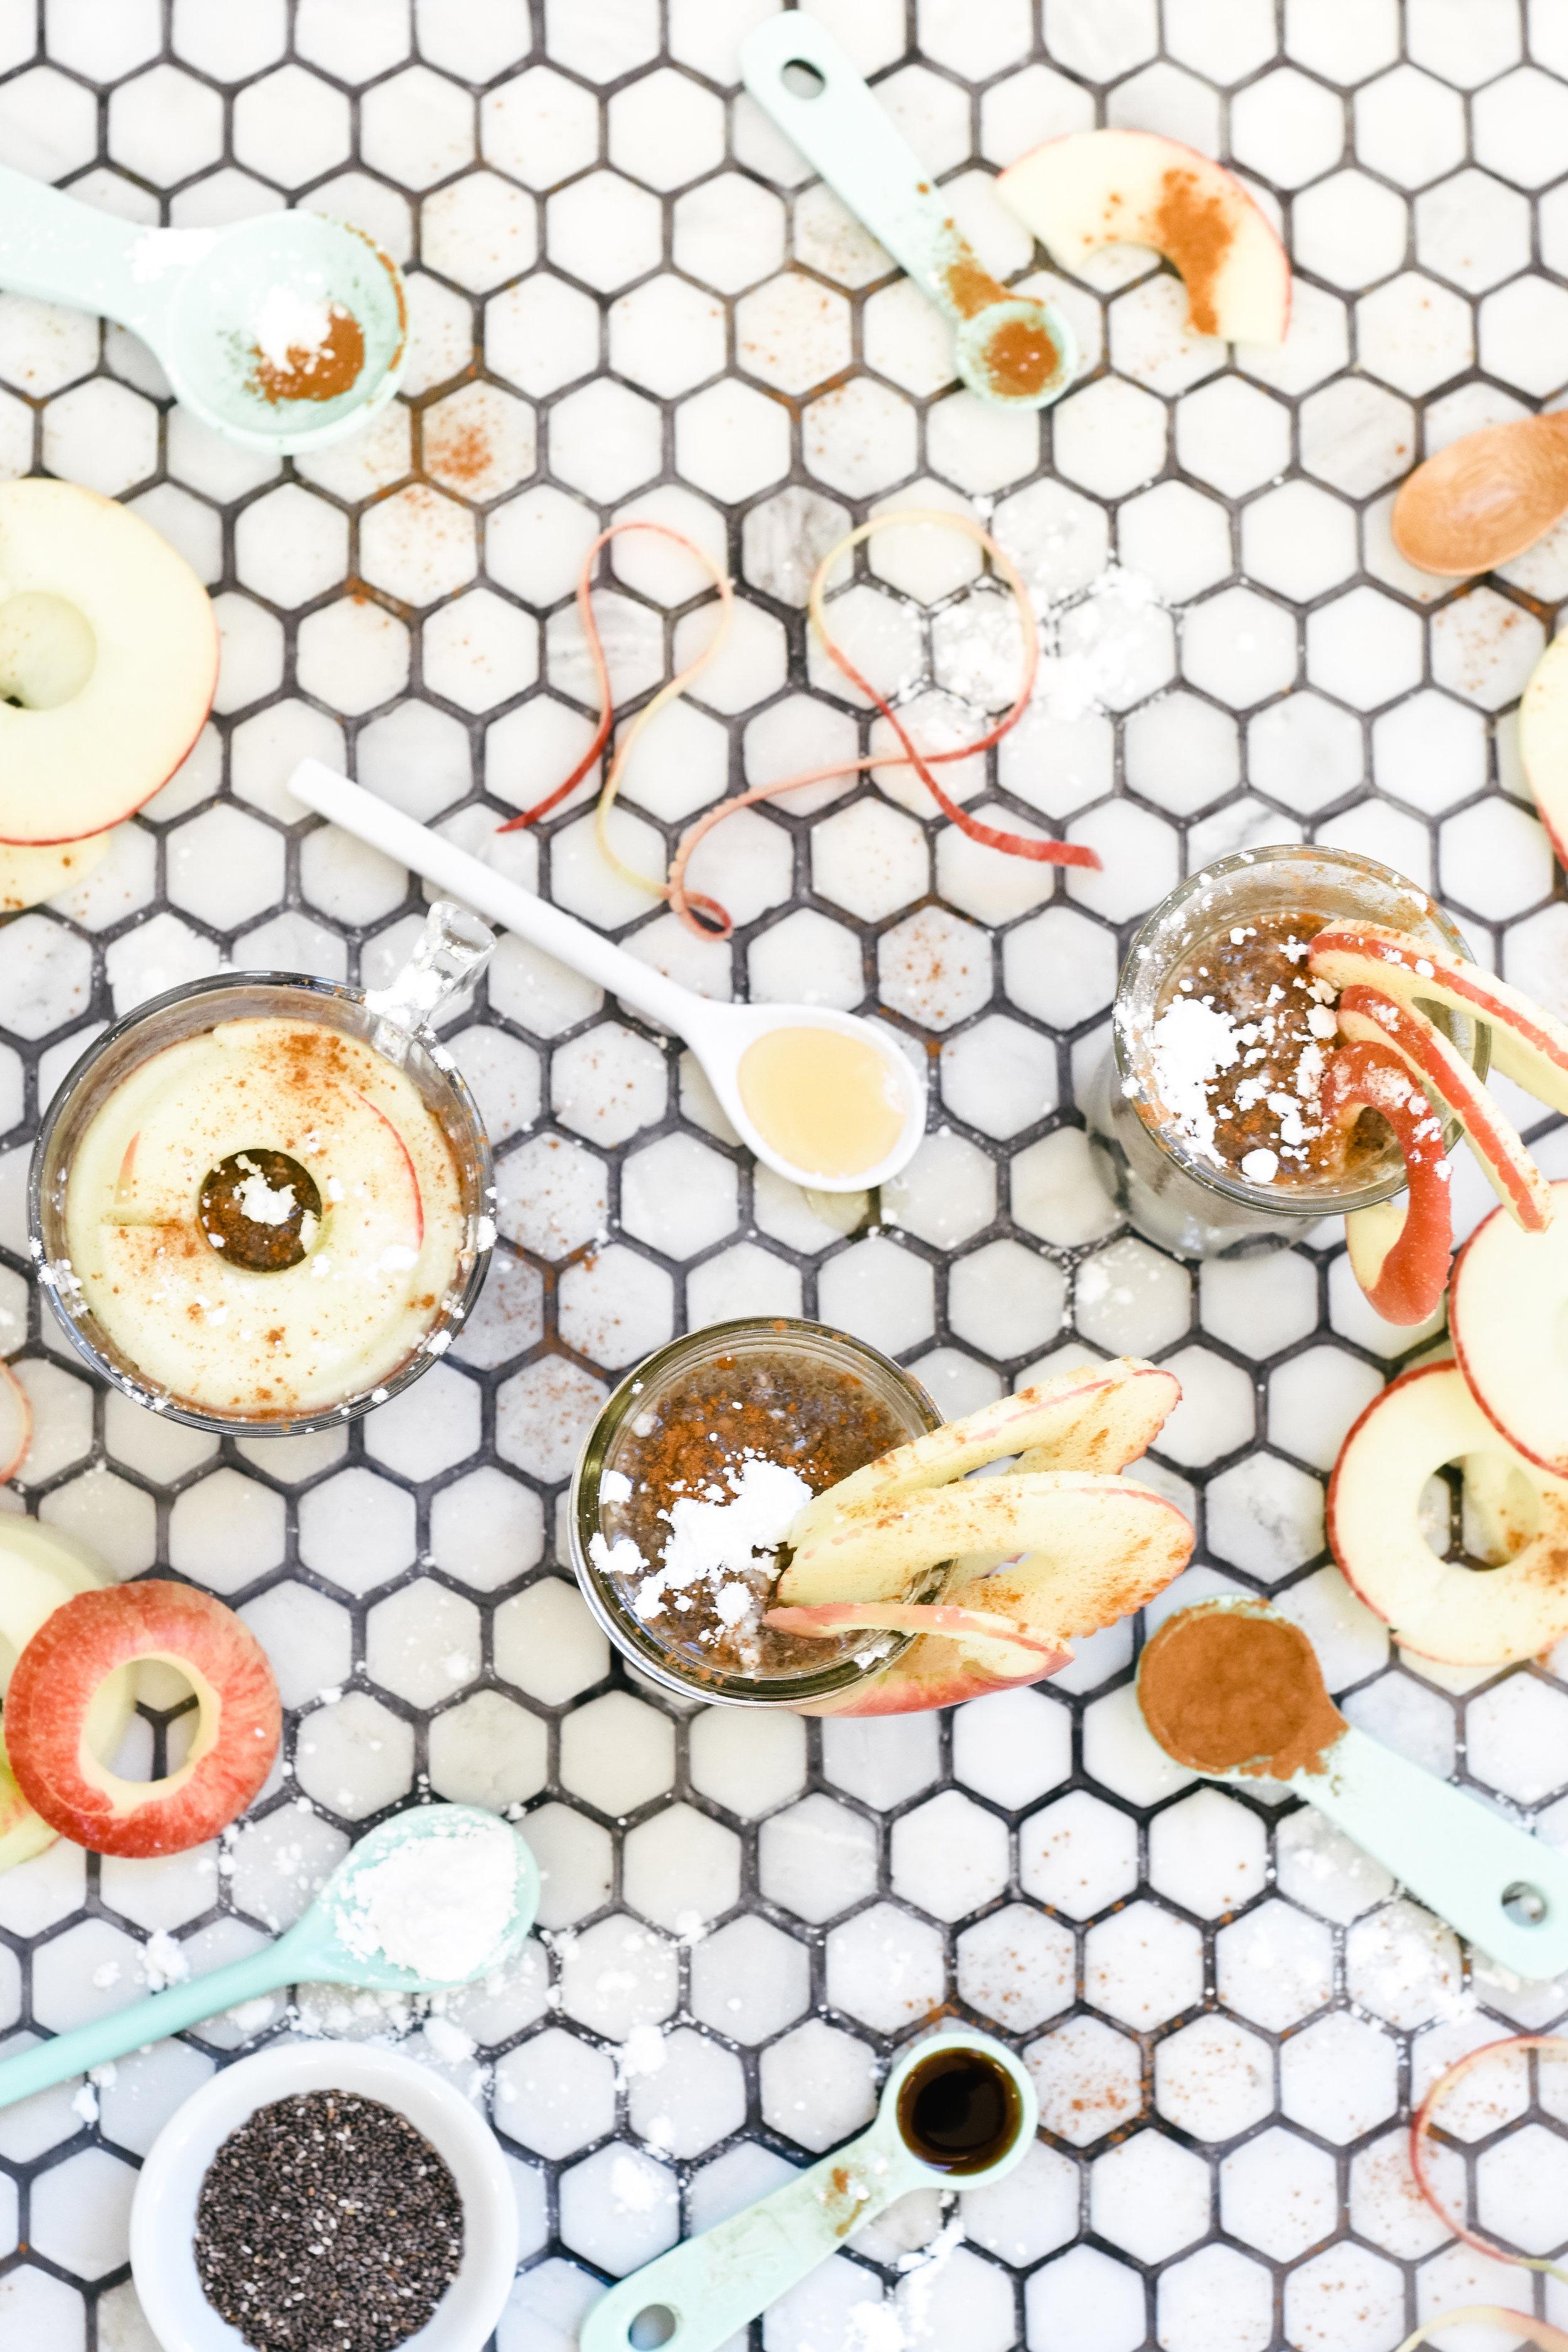 Apple Cinnamon Vegan Chia Seed Pudding with Good Karma Flax Milk